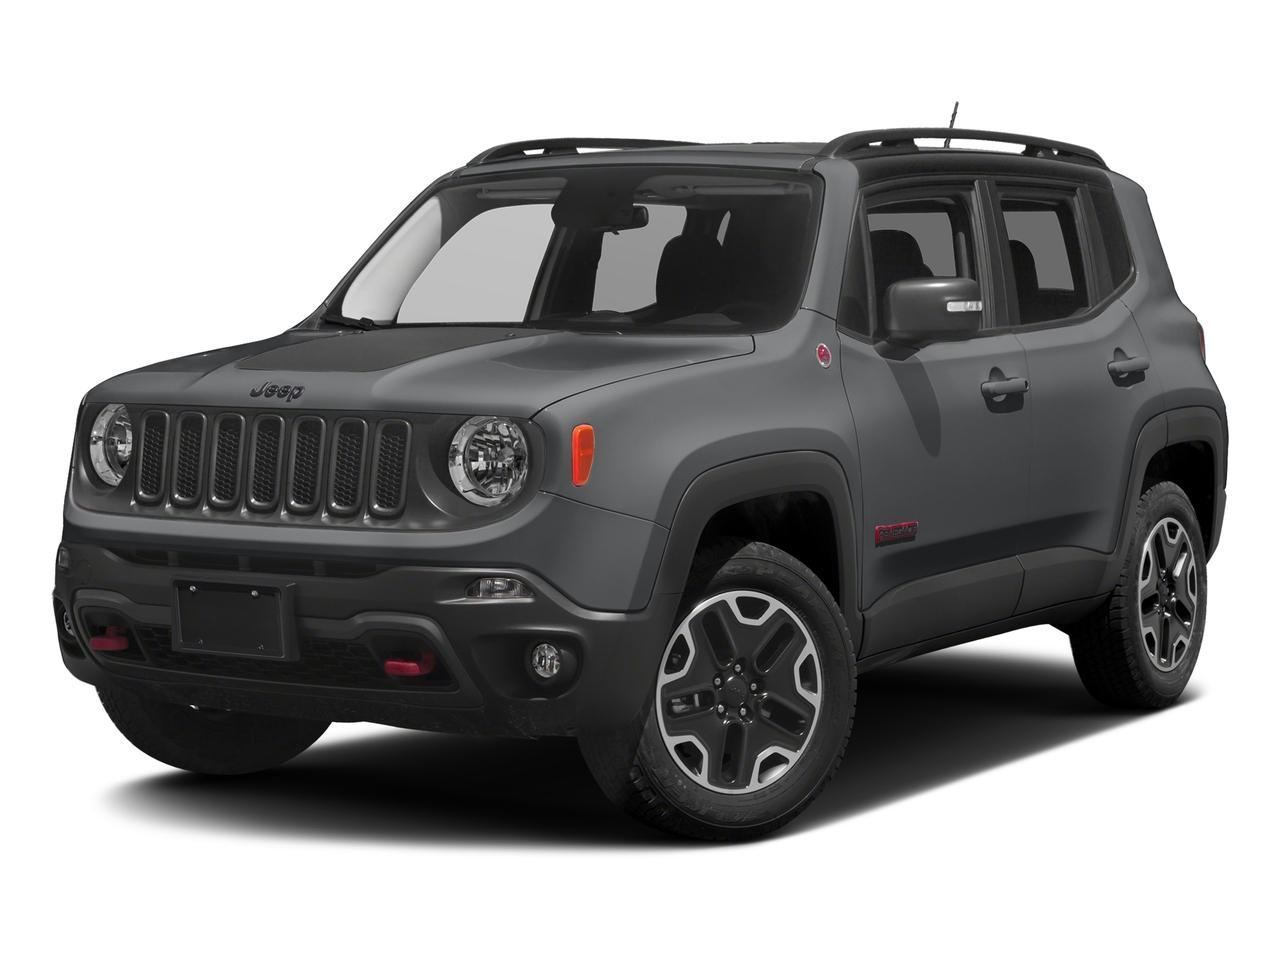 2017 Jeep Renegade Vehicle Photo in Philadelphia, PA 19116